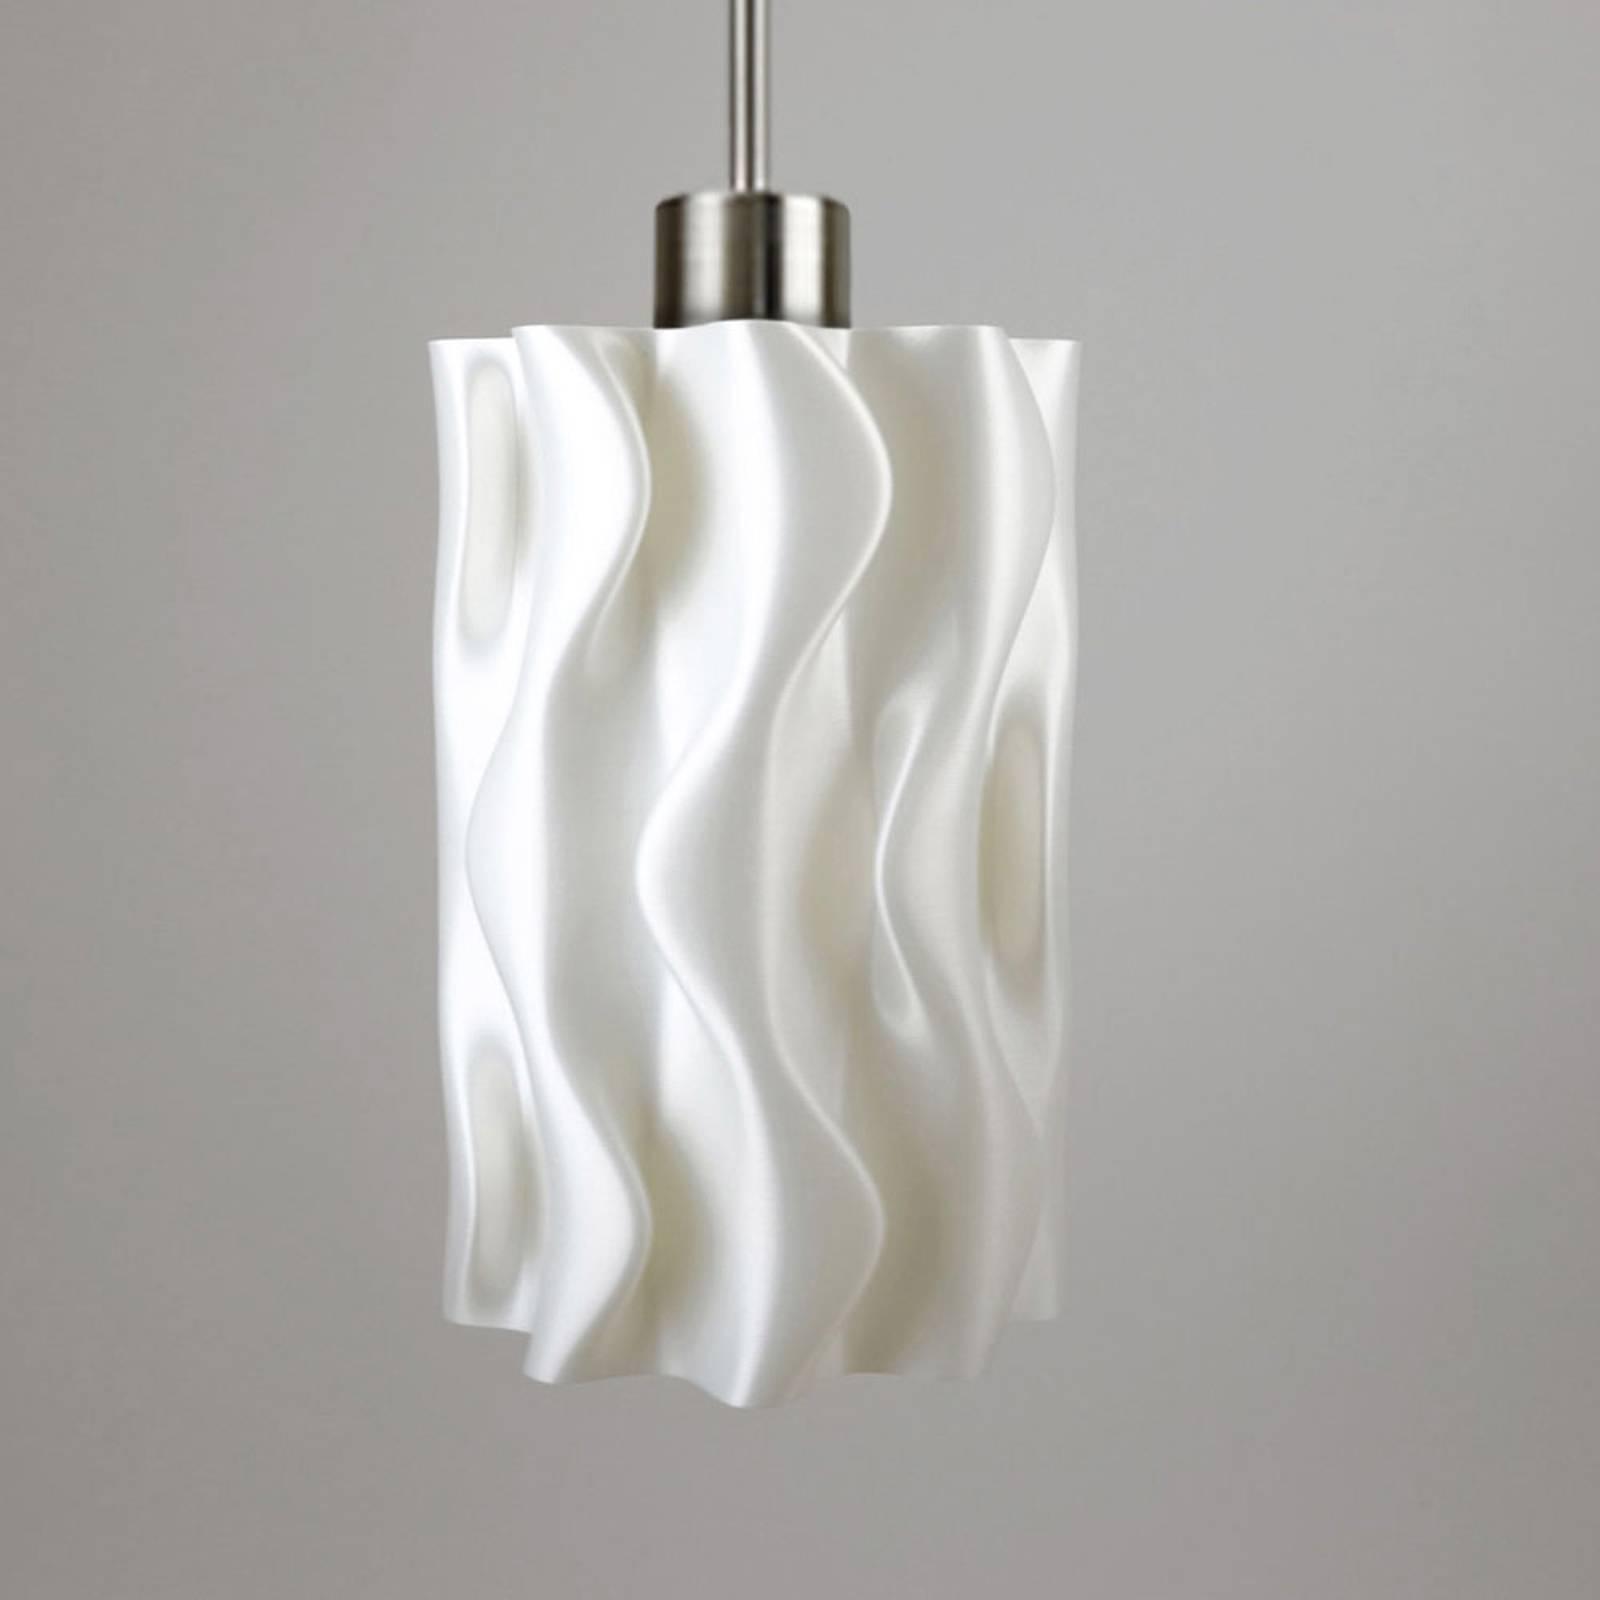 Lampa wisząca Amöbe, druk 3D, biała